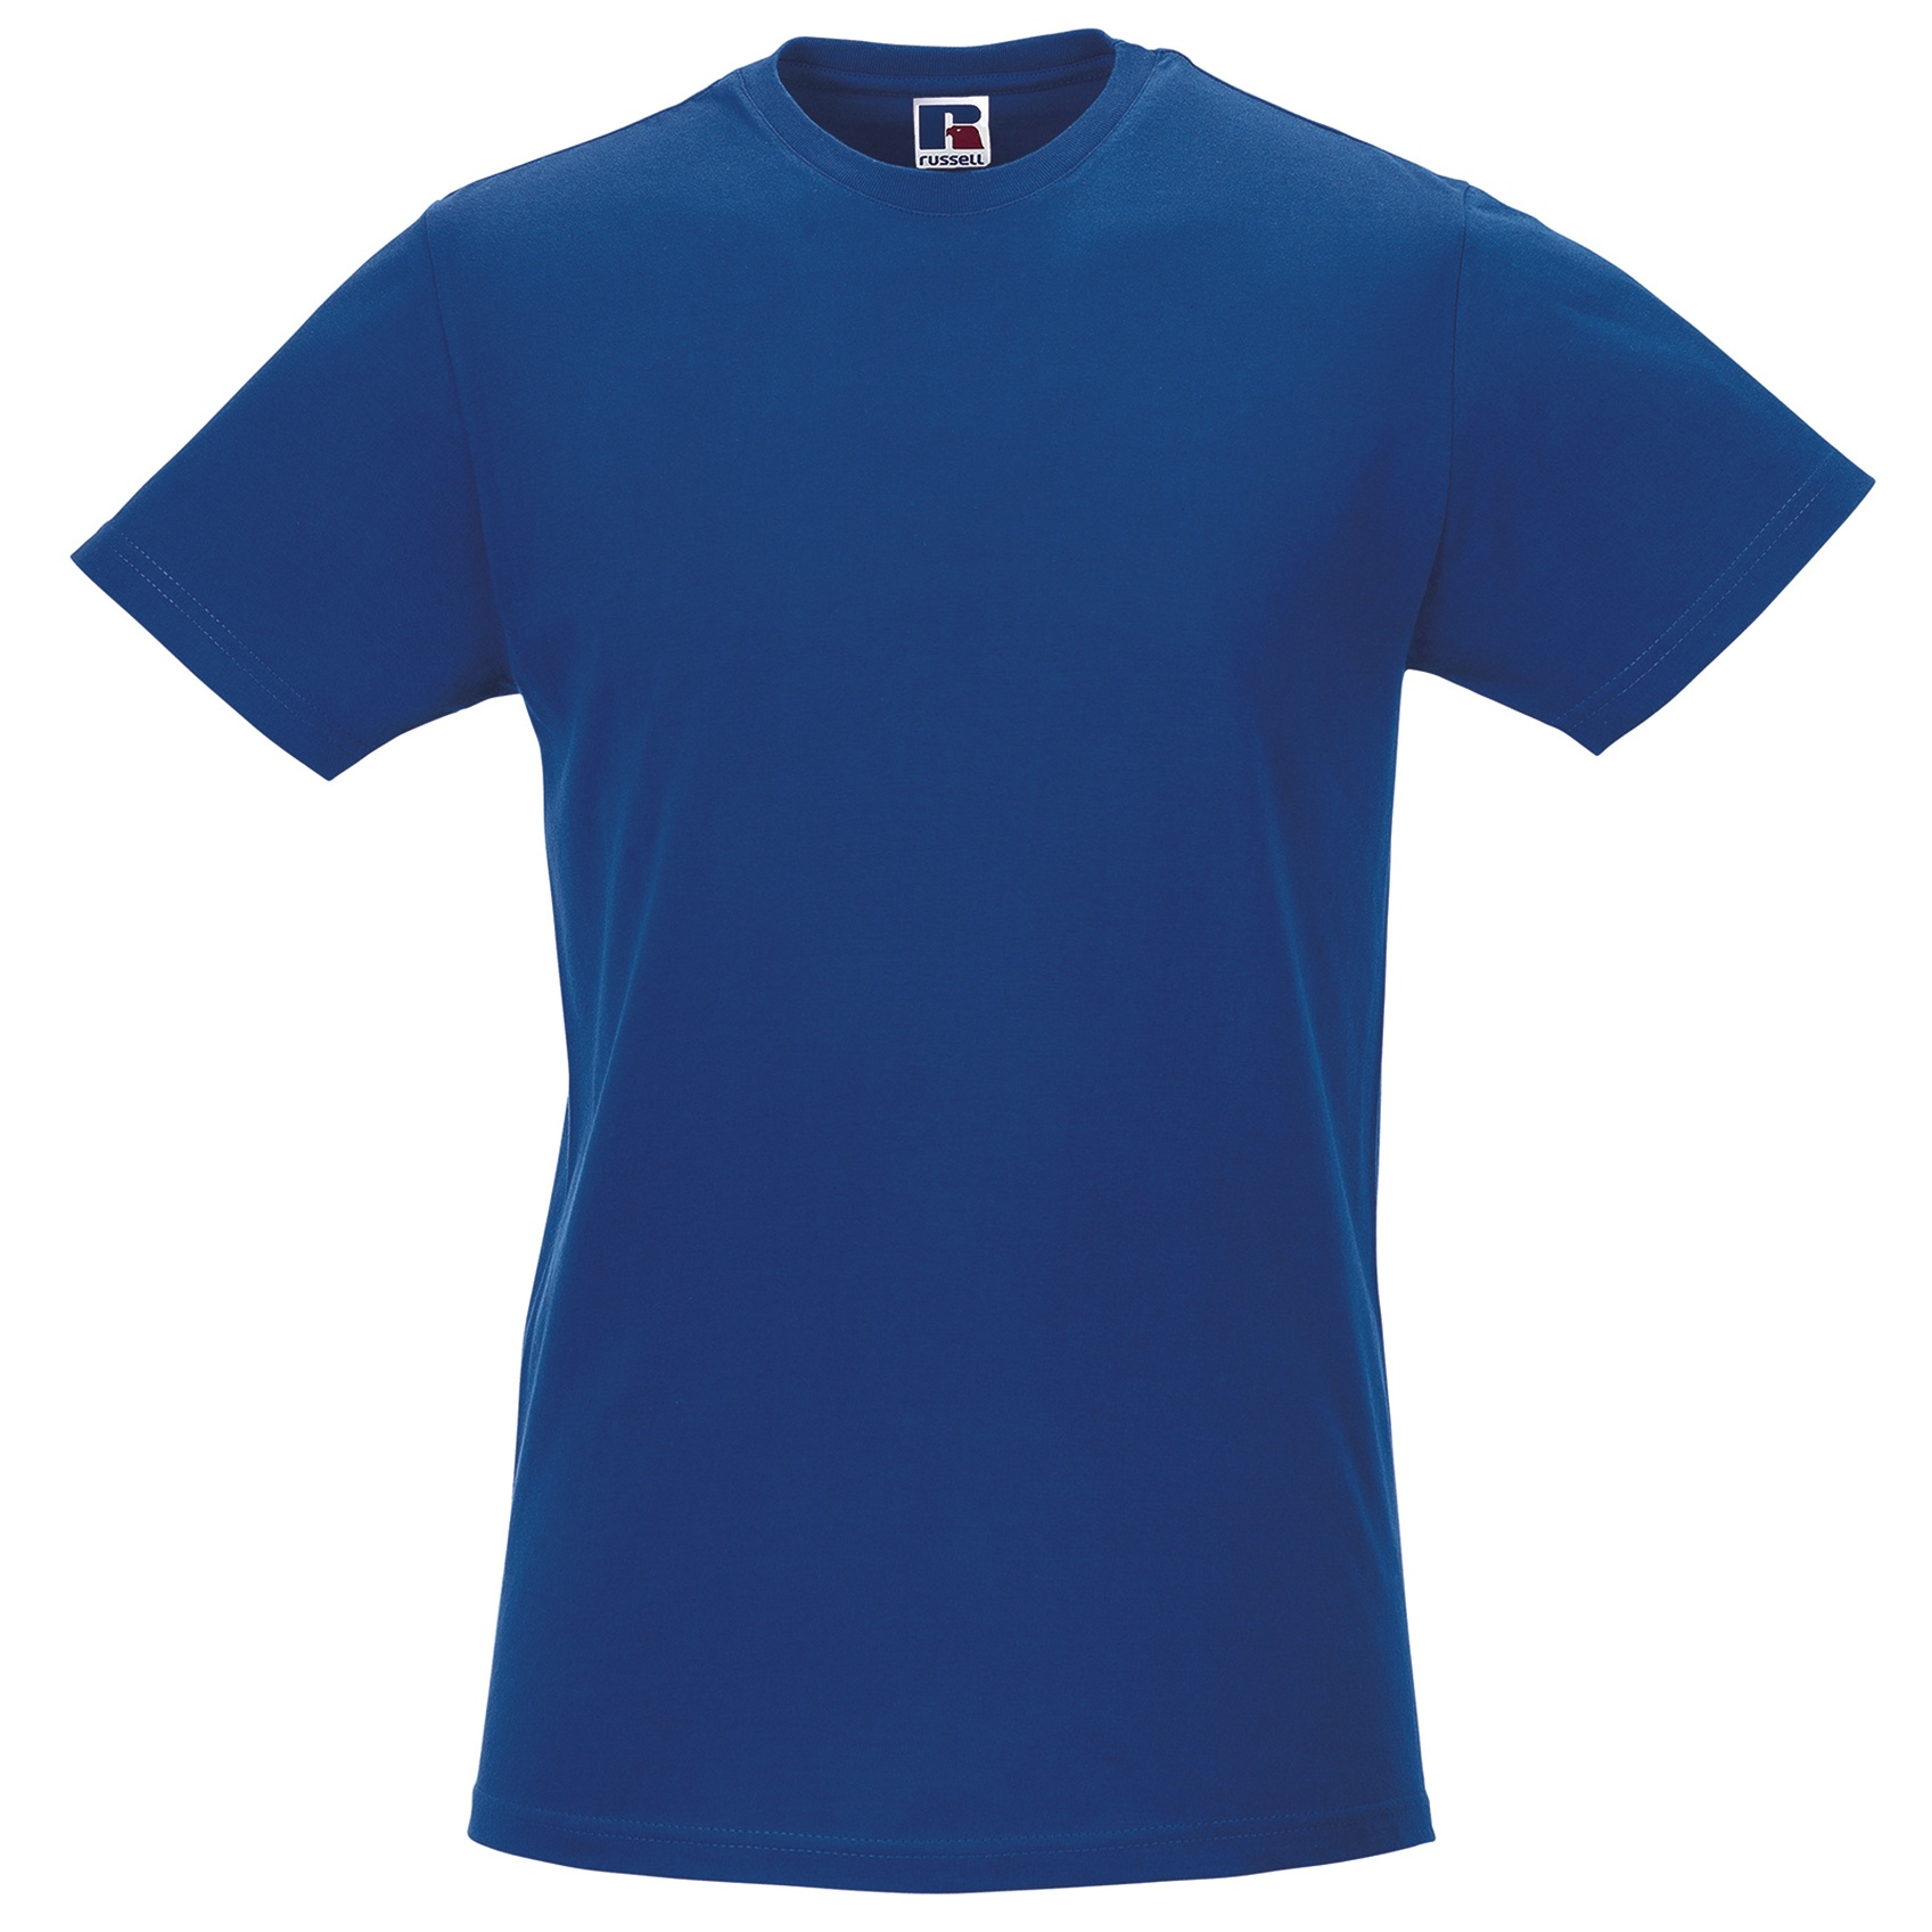 Russell-Mens-Slim-Plain-Blank-100-Cotton-Short-Sleeve-T-Shirt-Tee-BC1515 thumbnail 11